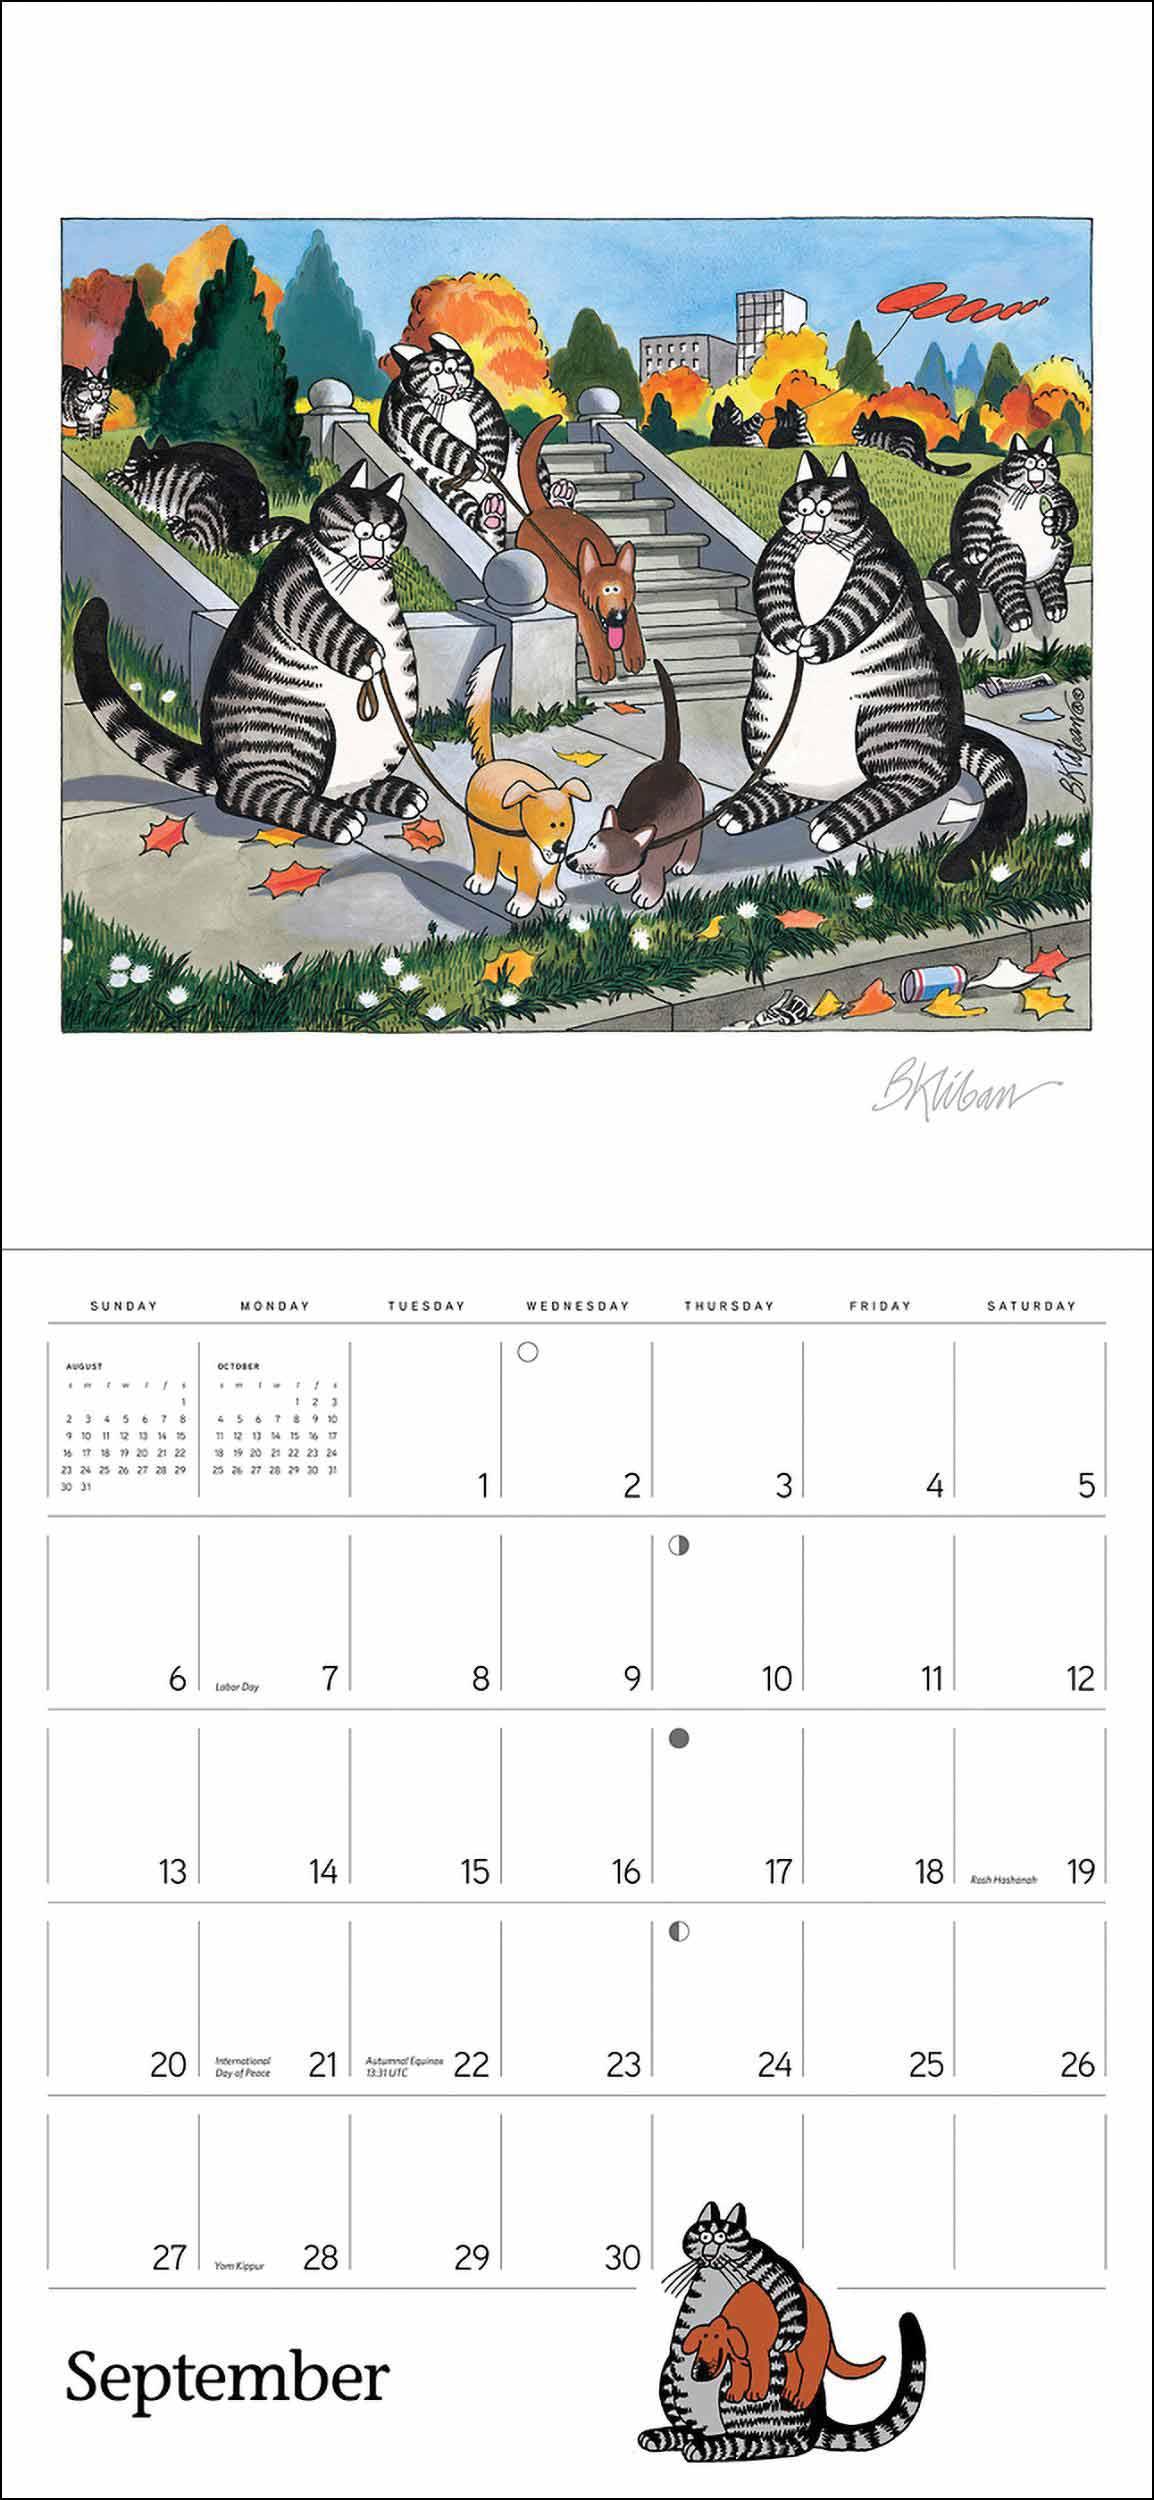 B Kliban, Cat Calendar 2020